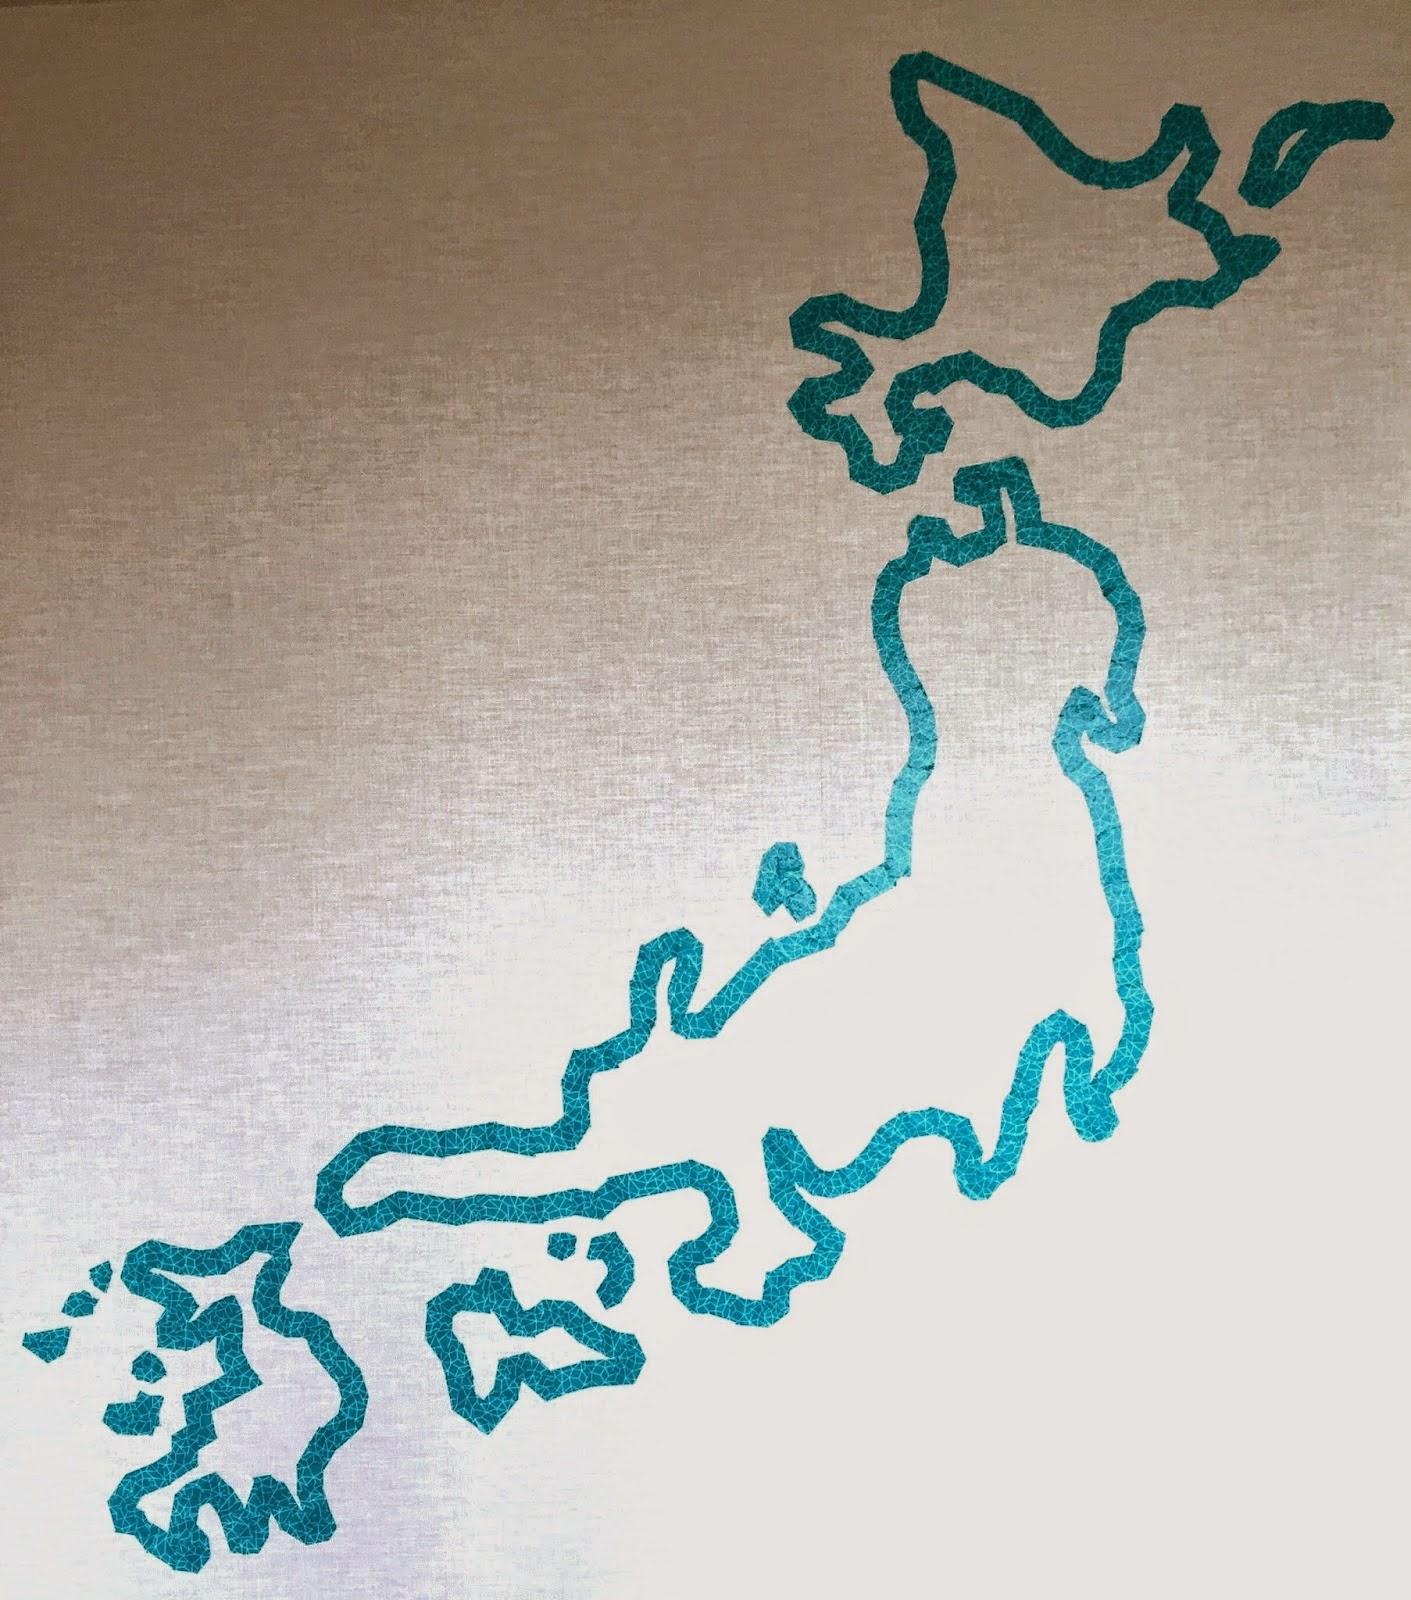 Washi Tape Wall Art washi tape wall art | elephantandchick